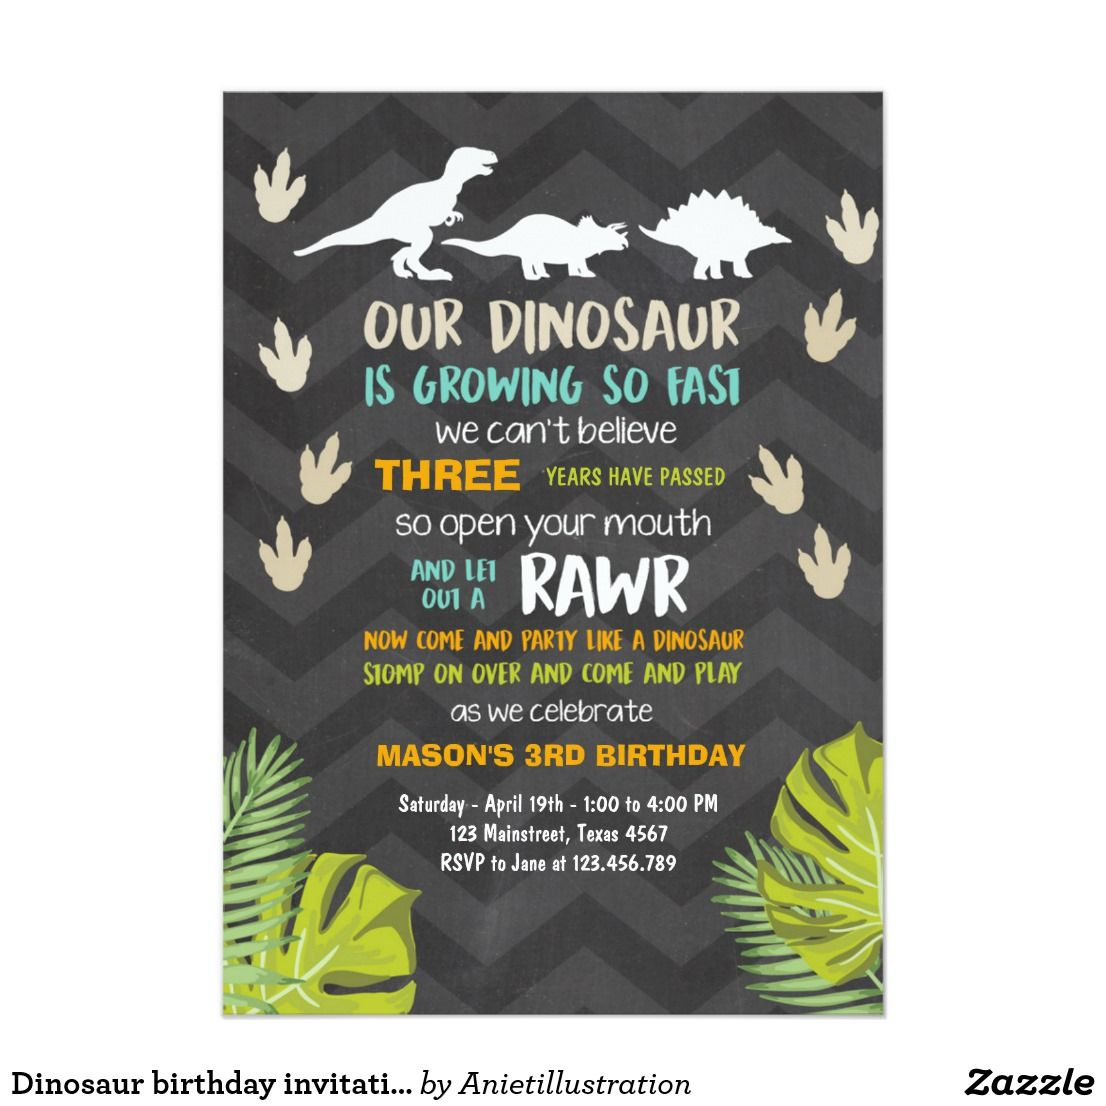 Dinosaur birthday invitation Dinosaur Party Chalk | Dinosaur ...